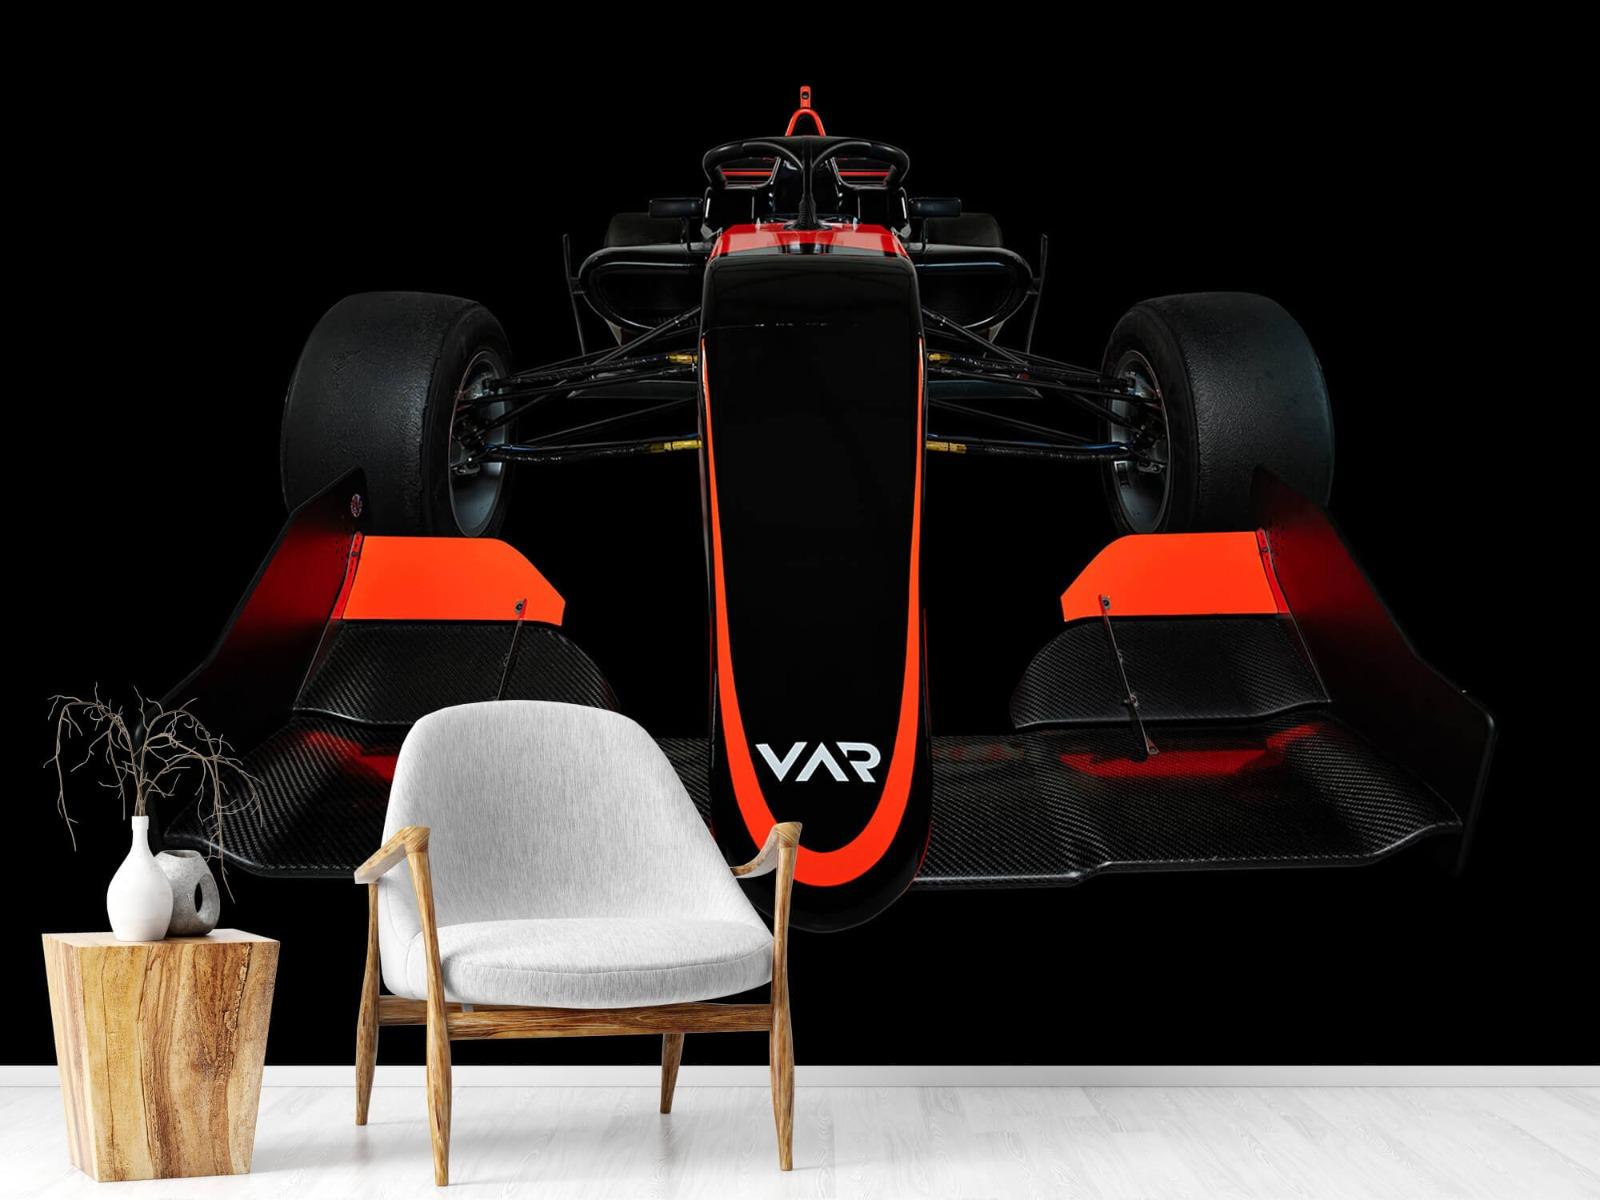 Sportauto's - Formule 3 - Lower front view - dark - Slaapkamer 19